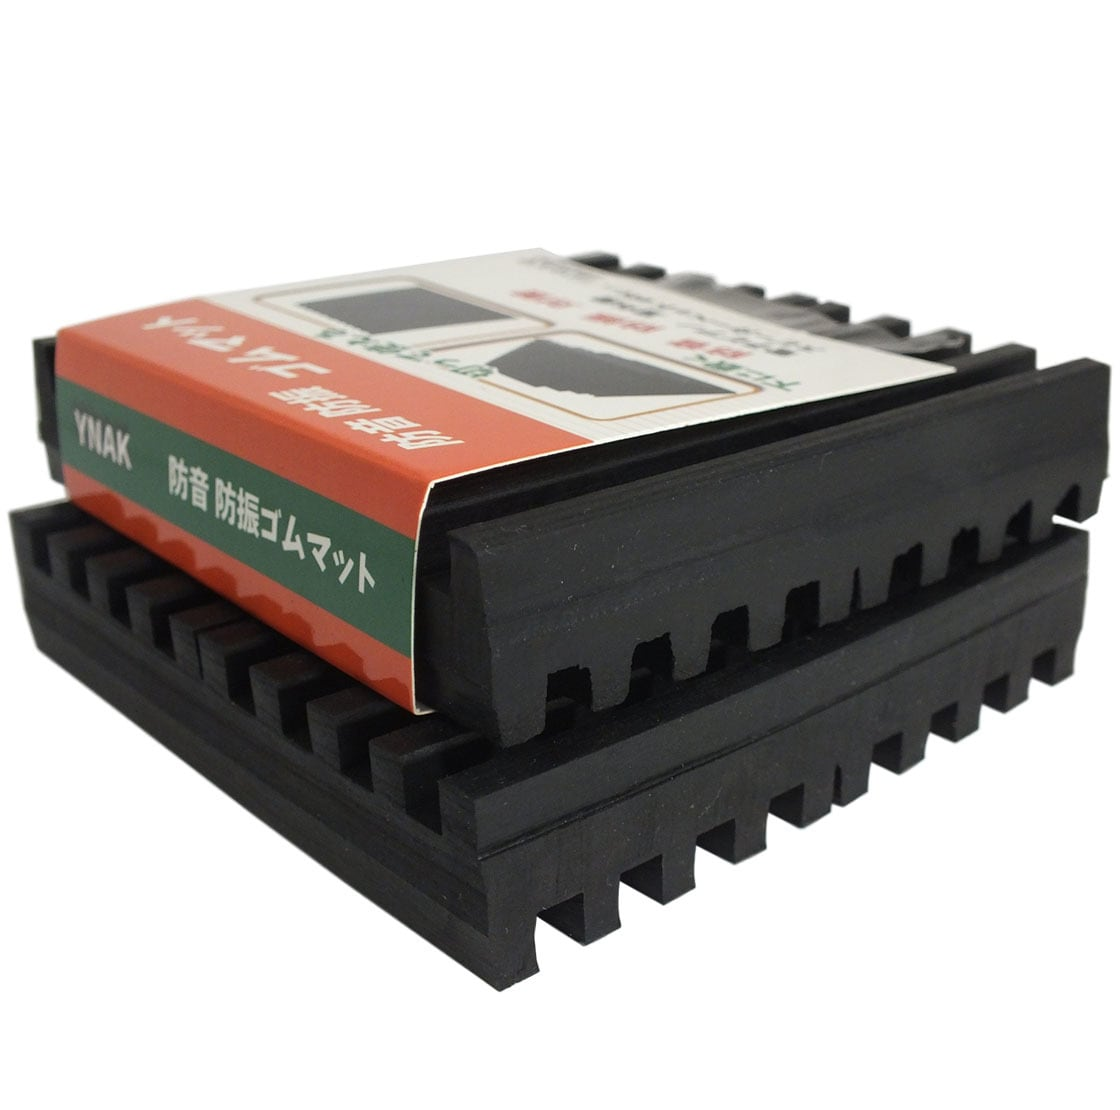 YNAK ピアノ スピーカー 家庭用機器 下に敷く 滑り止め ゴム マット セット 防振 防音 対策 (10cm×10cm×2cm 2枚)